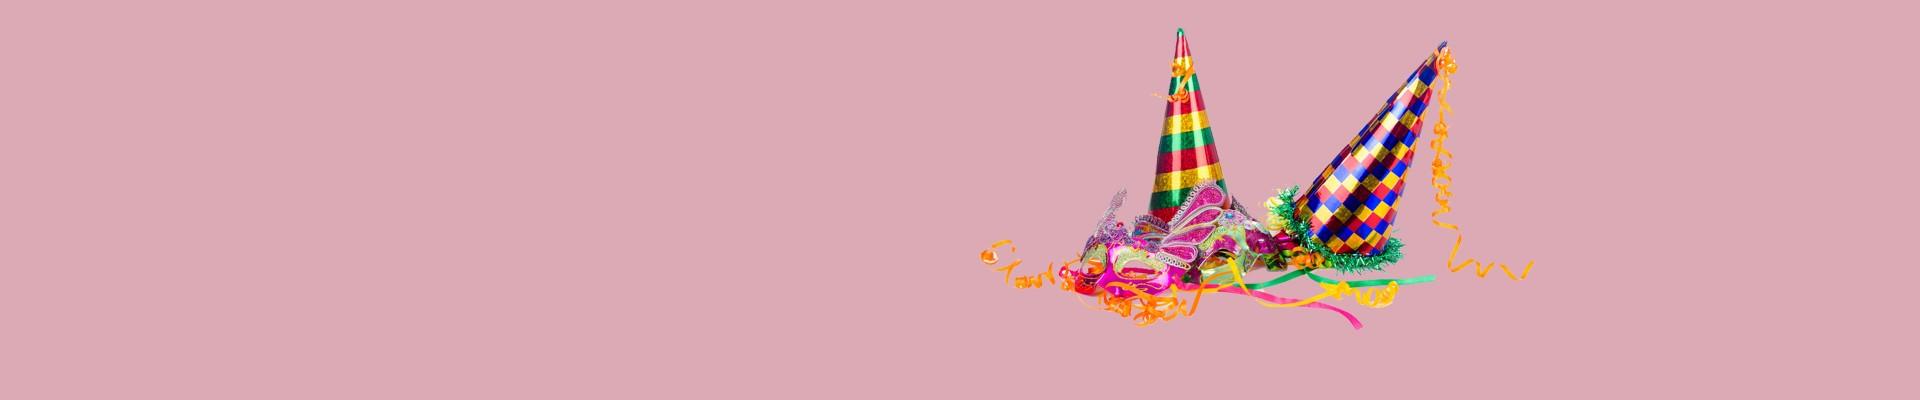 Jual Perlengkapan Pesta / Perlengkapan Pesta Ulang Tahun Lengkap